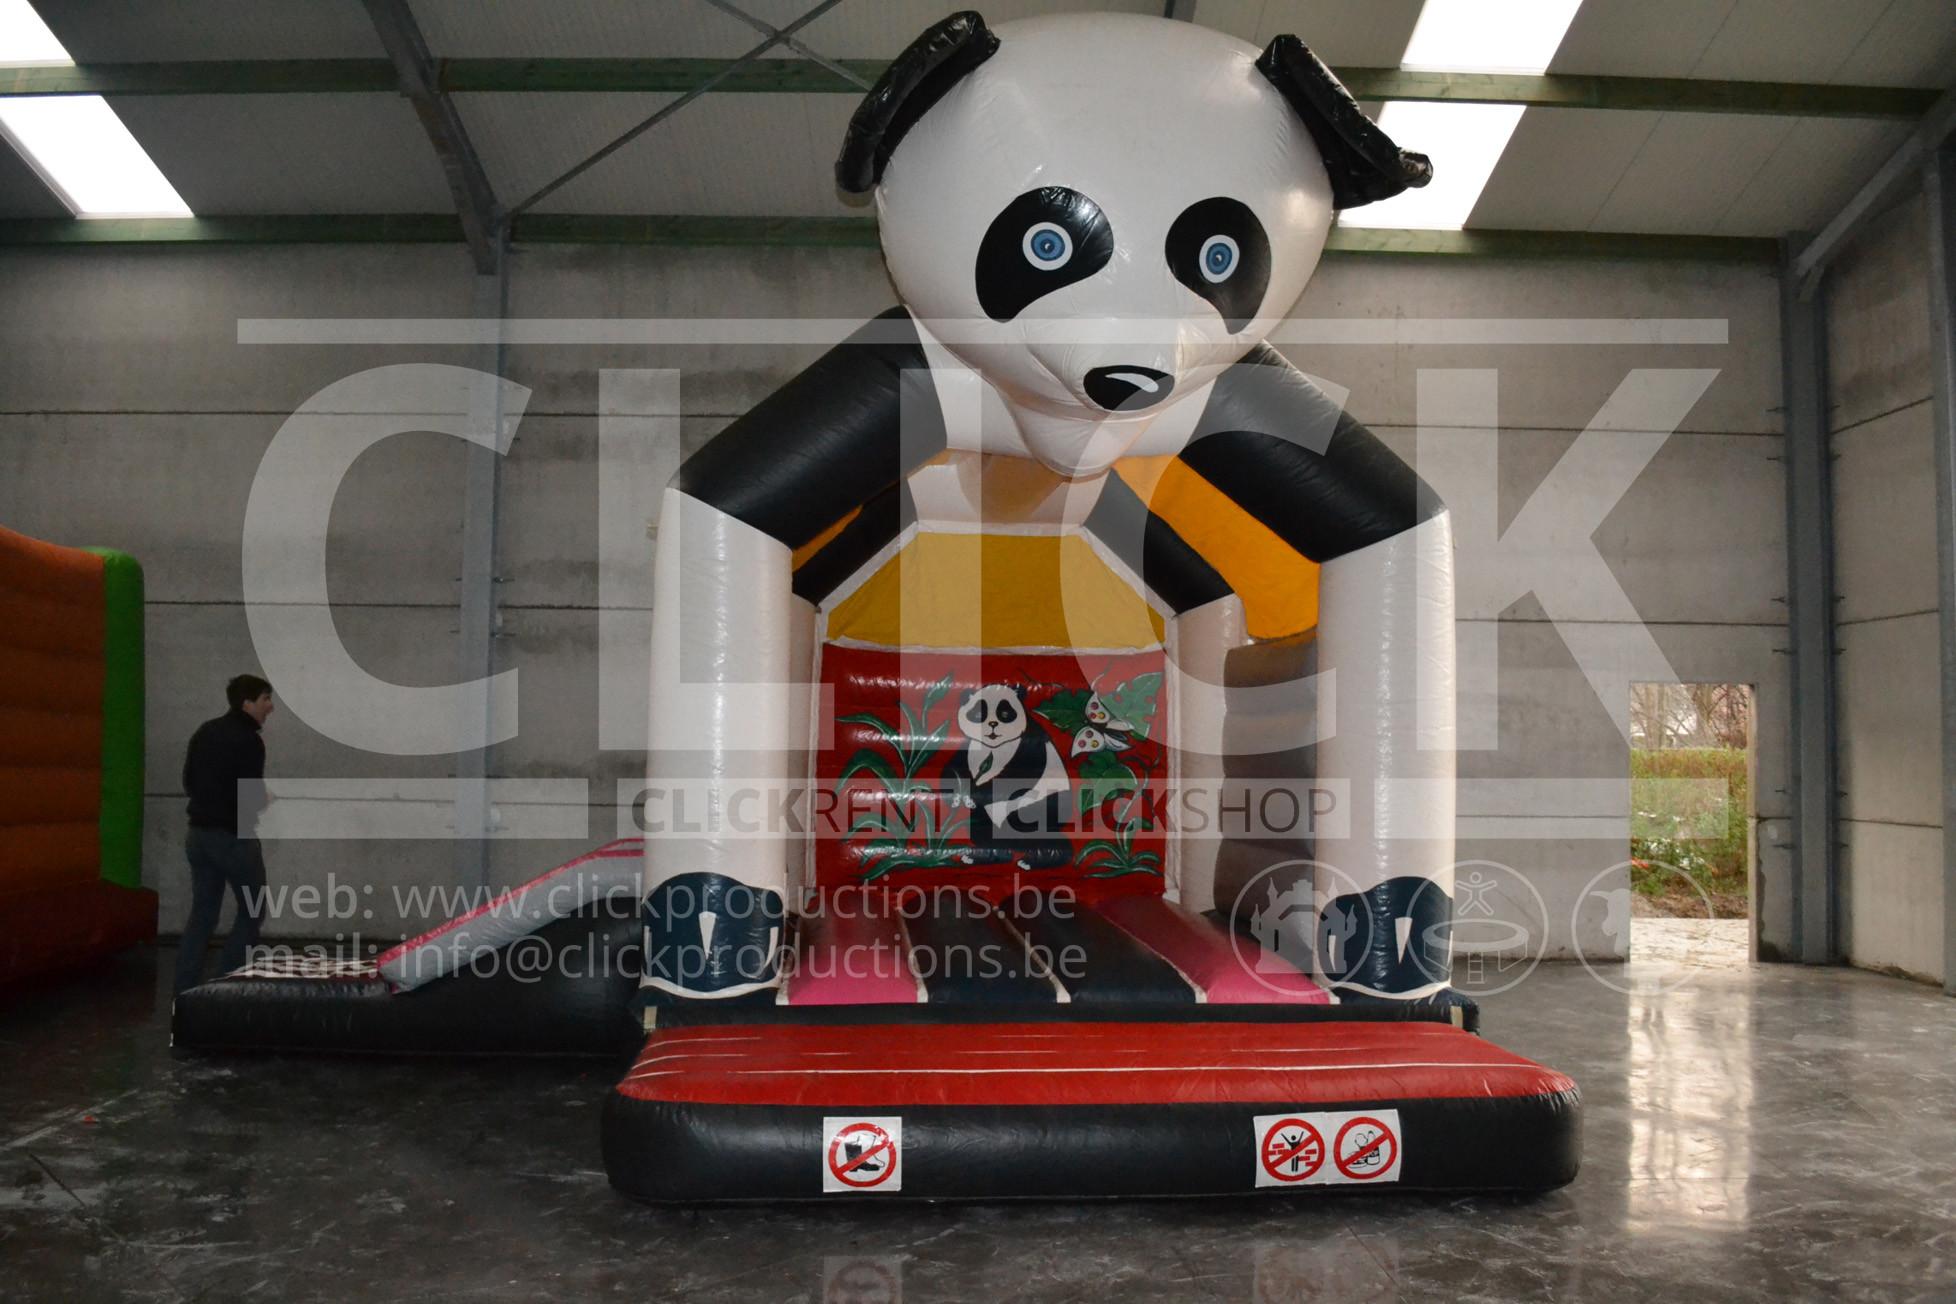 springkasteel panda klein huren click rent. Black Bedroom Furniture Sets. Home Design Ideas